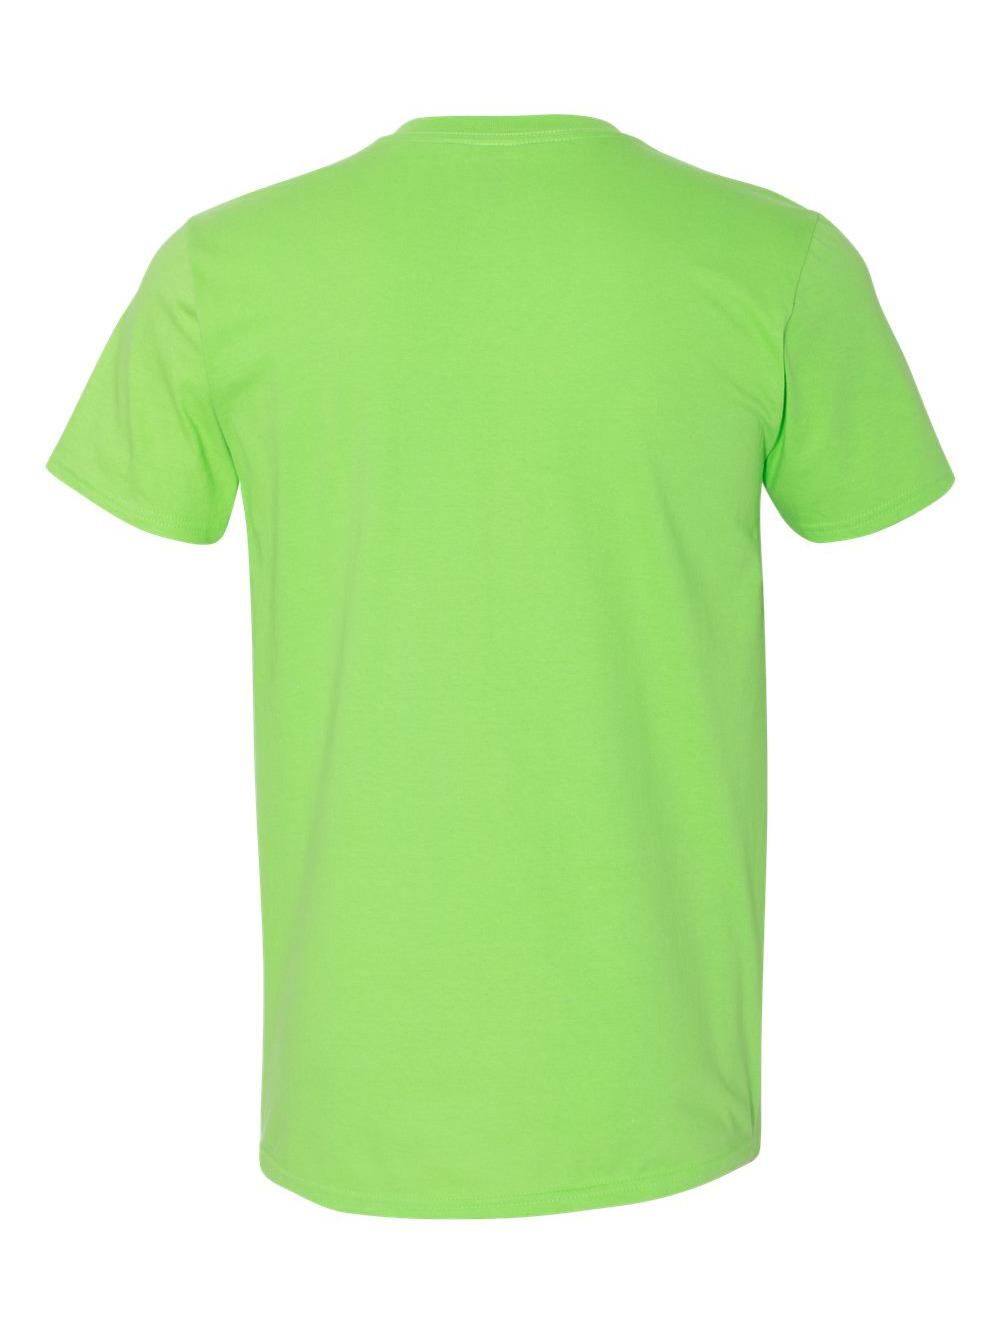 Gildan-Softstyle-T-Shirt-64000 thumbnail 124